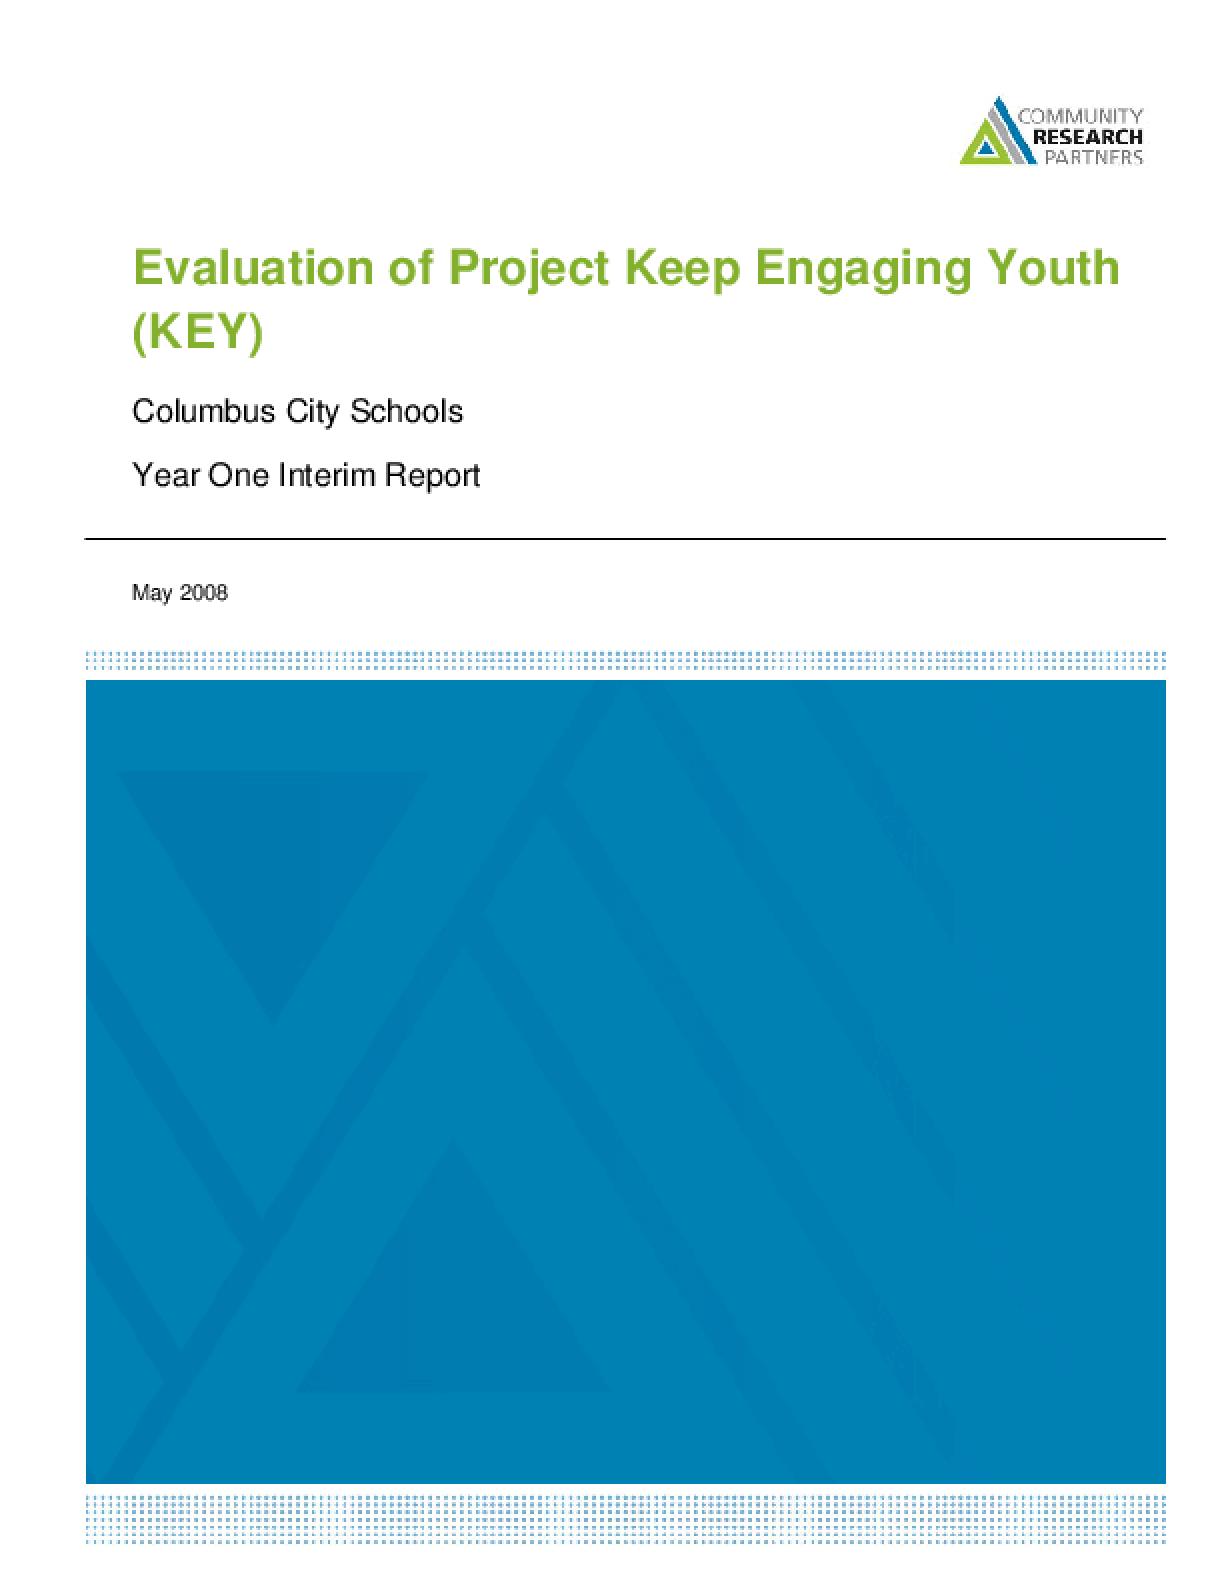 Keep Engaging Youth (KEY) Truancy Reduction Pilot Program Evaluation